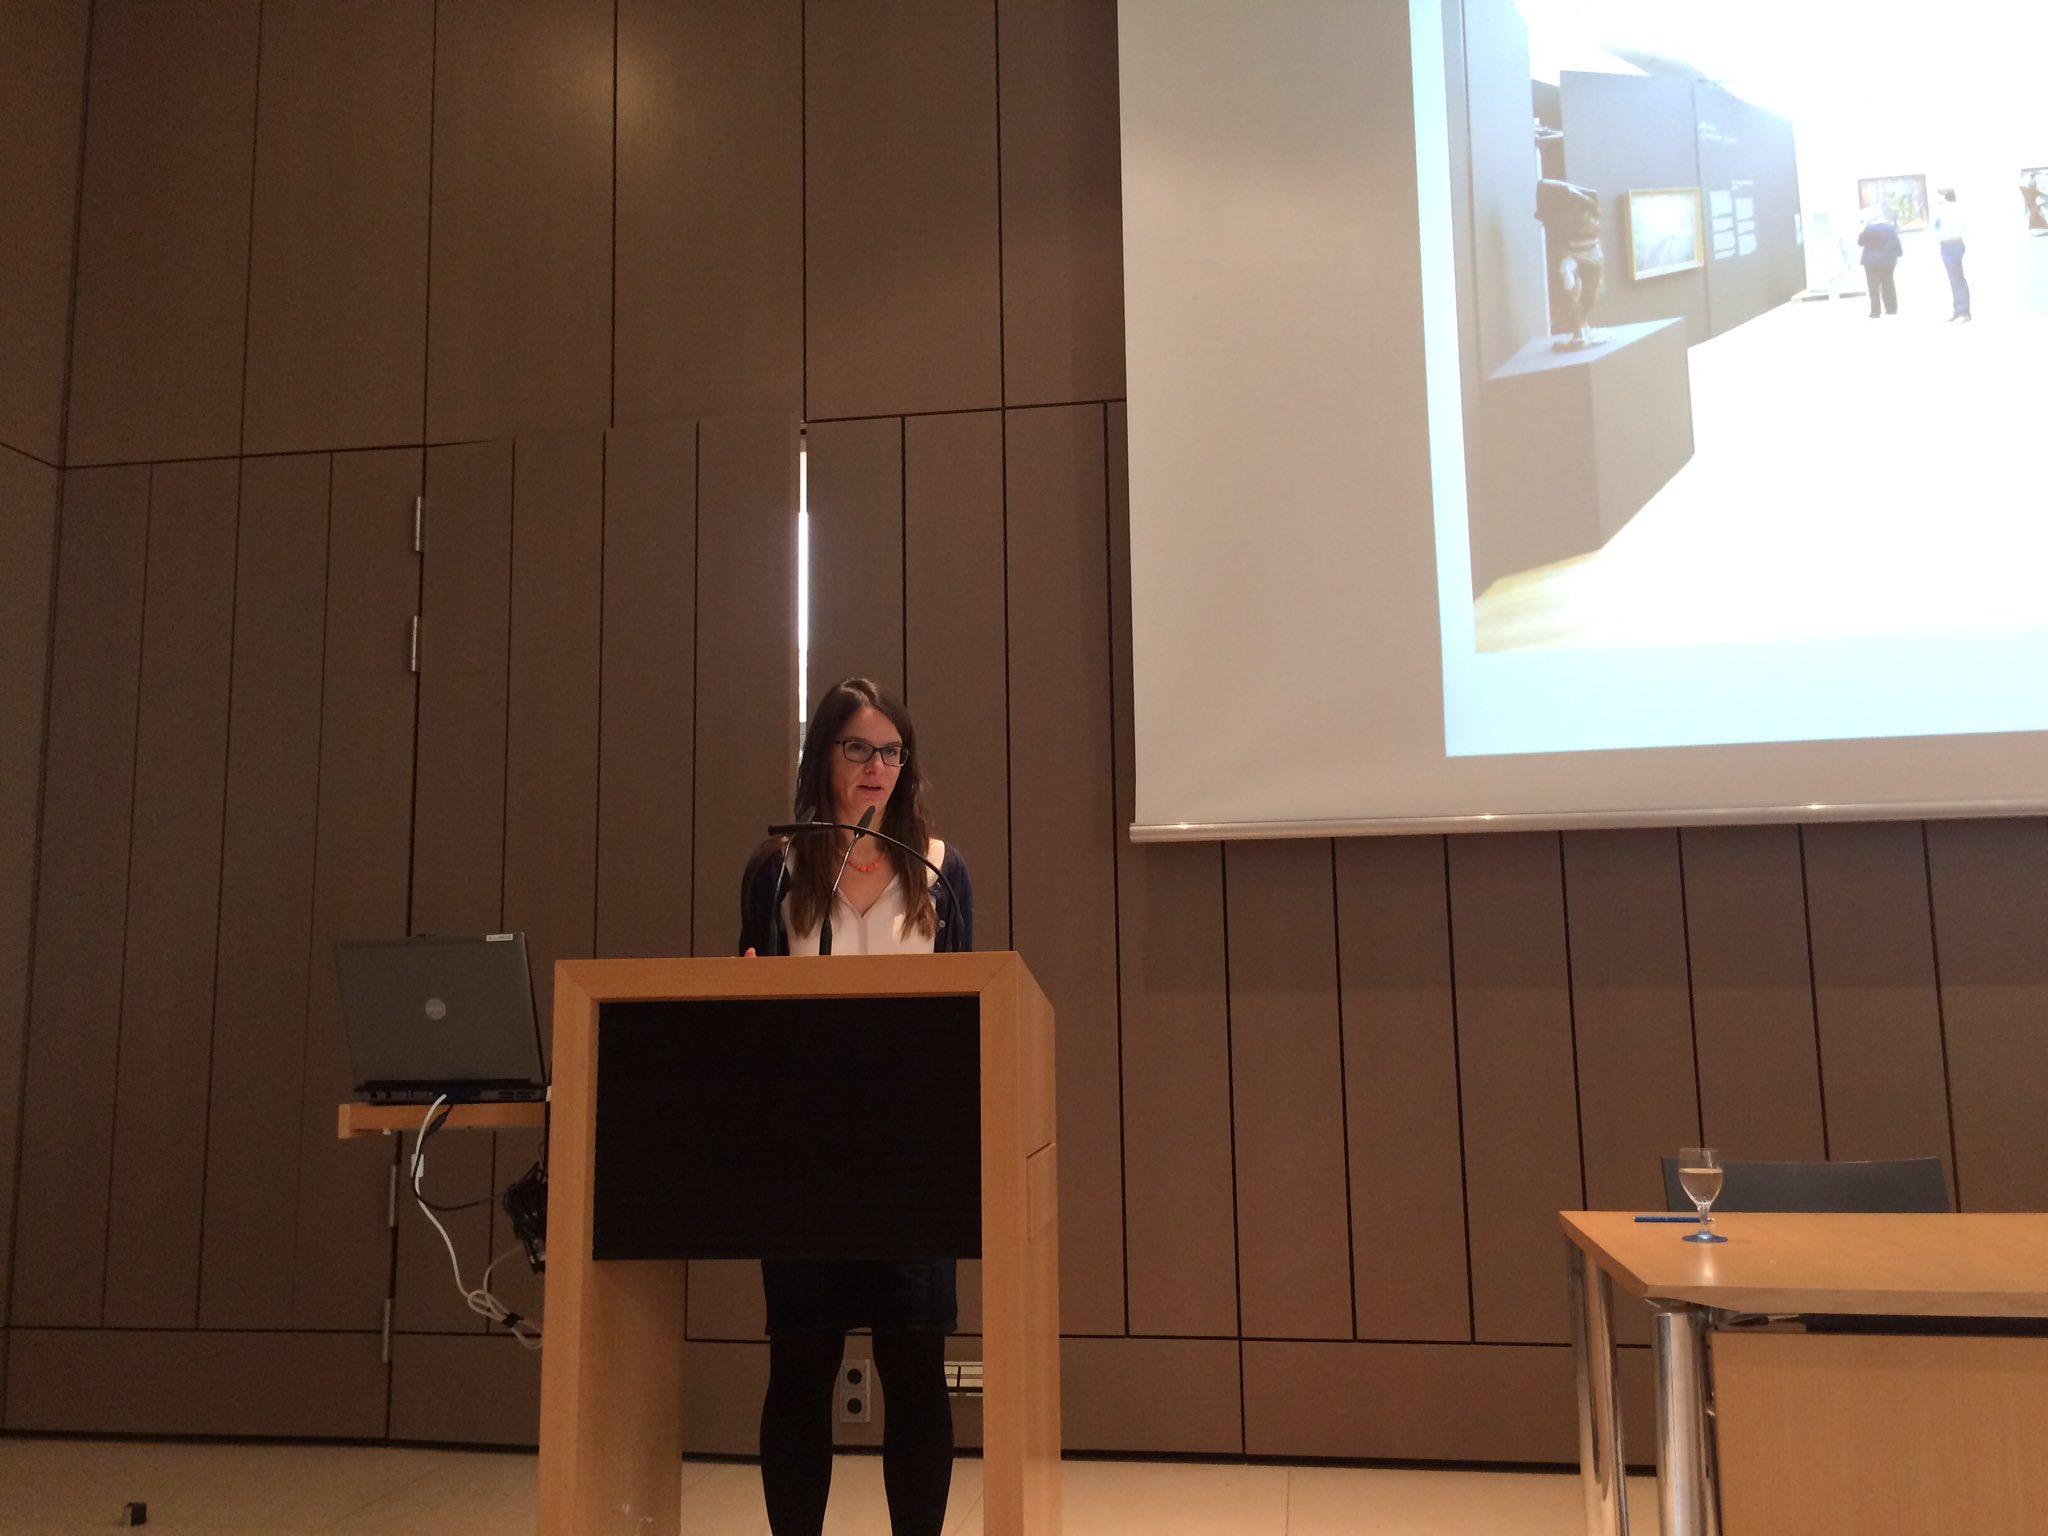 Heute für alle: 19h Residenzschloss @skdmuseum Maria Obenaus: 100Jahre Kulturgutschutzgesetz #ddss16 https://t.co/hAiZ10BoJS